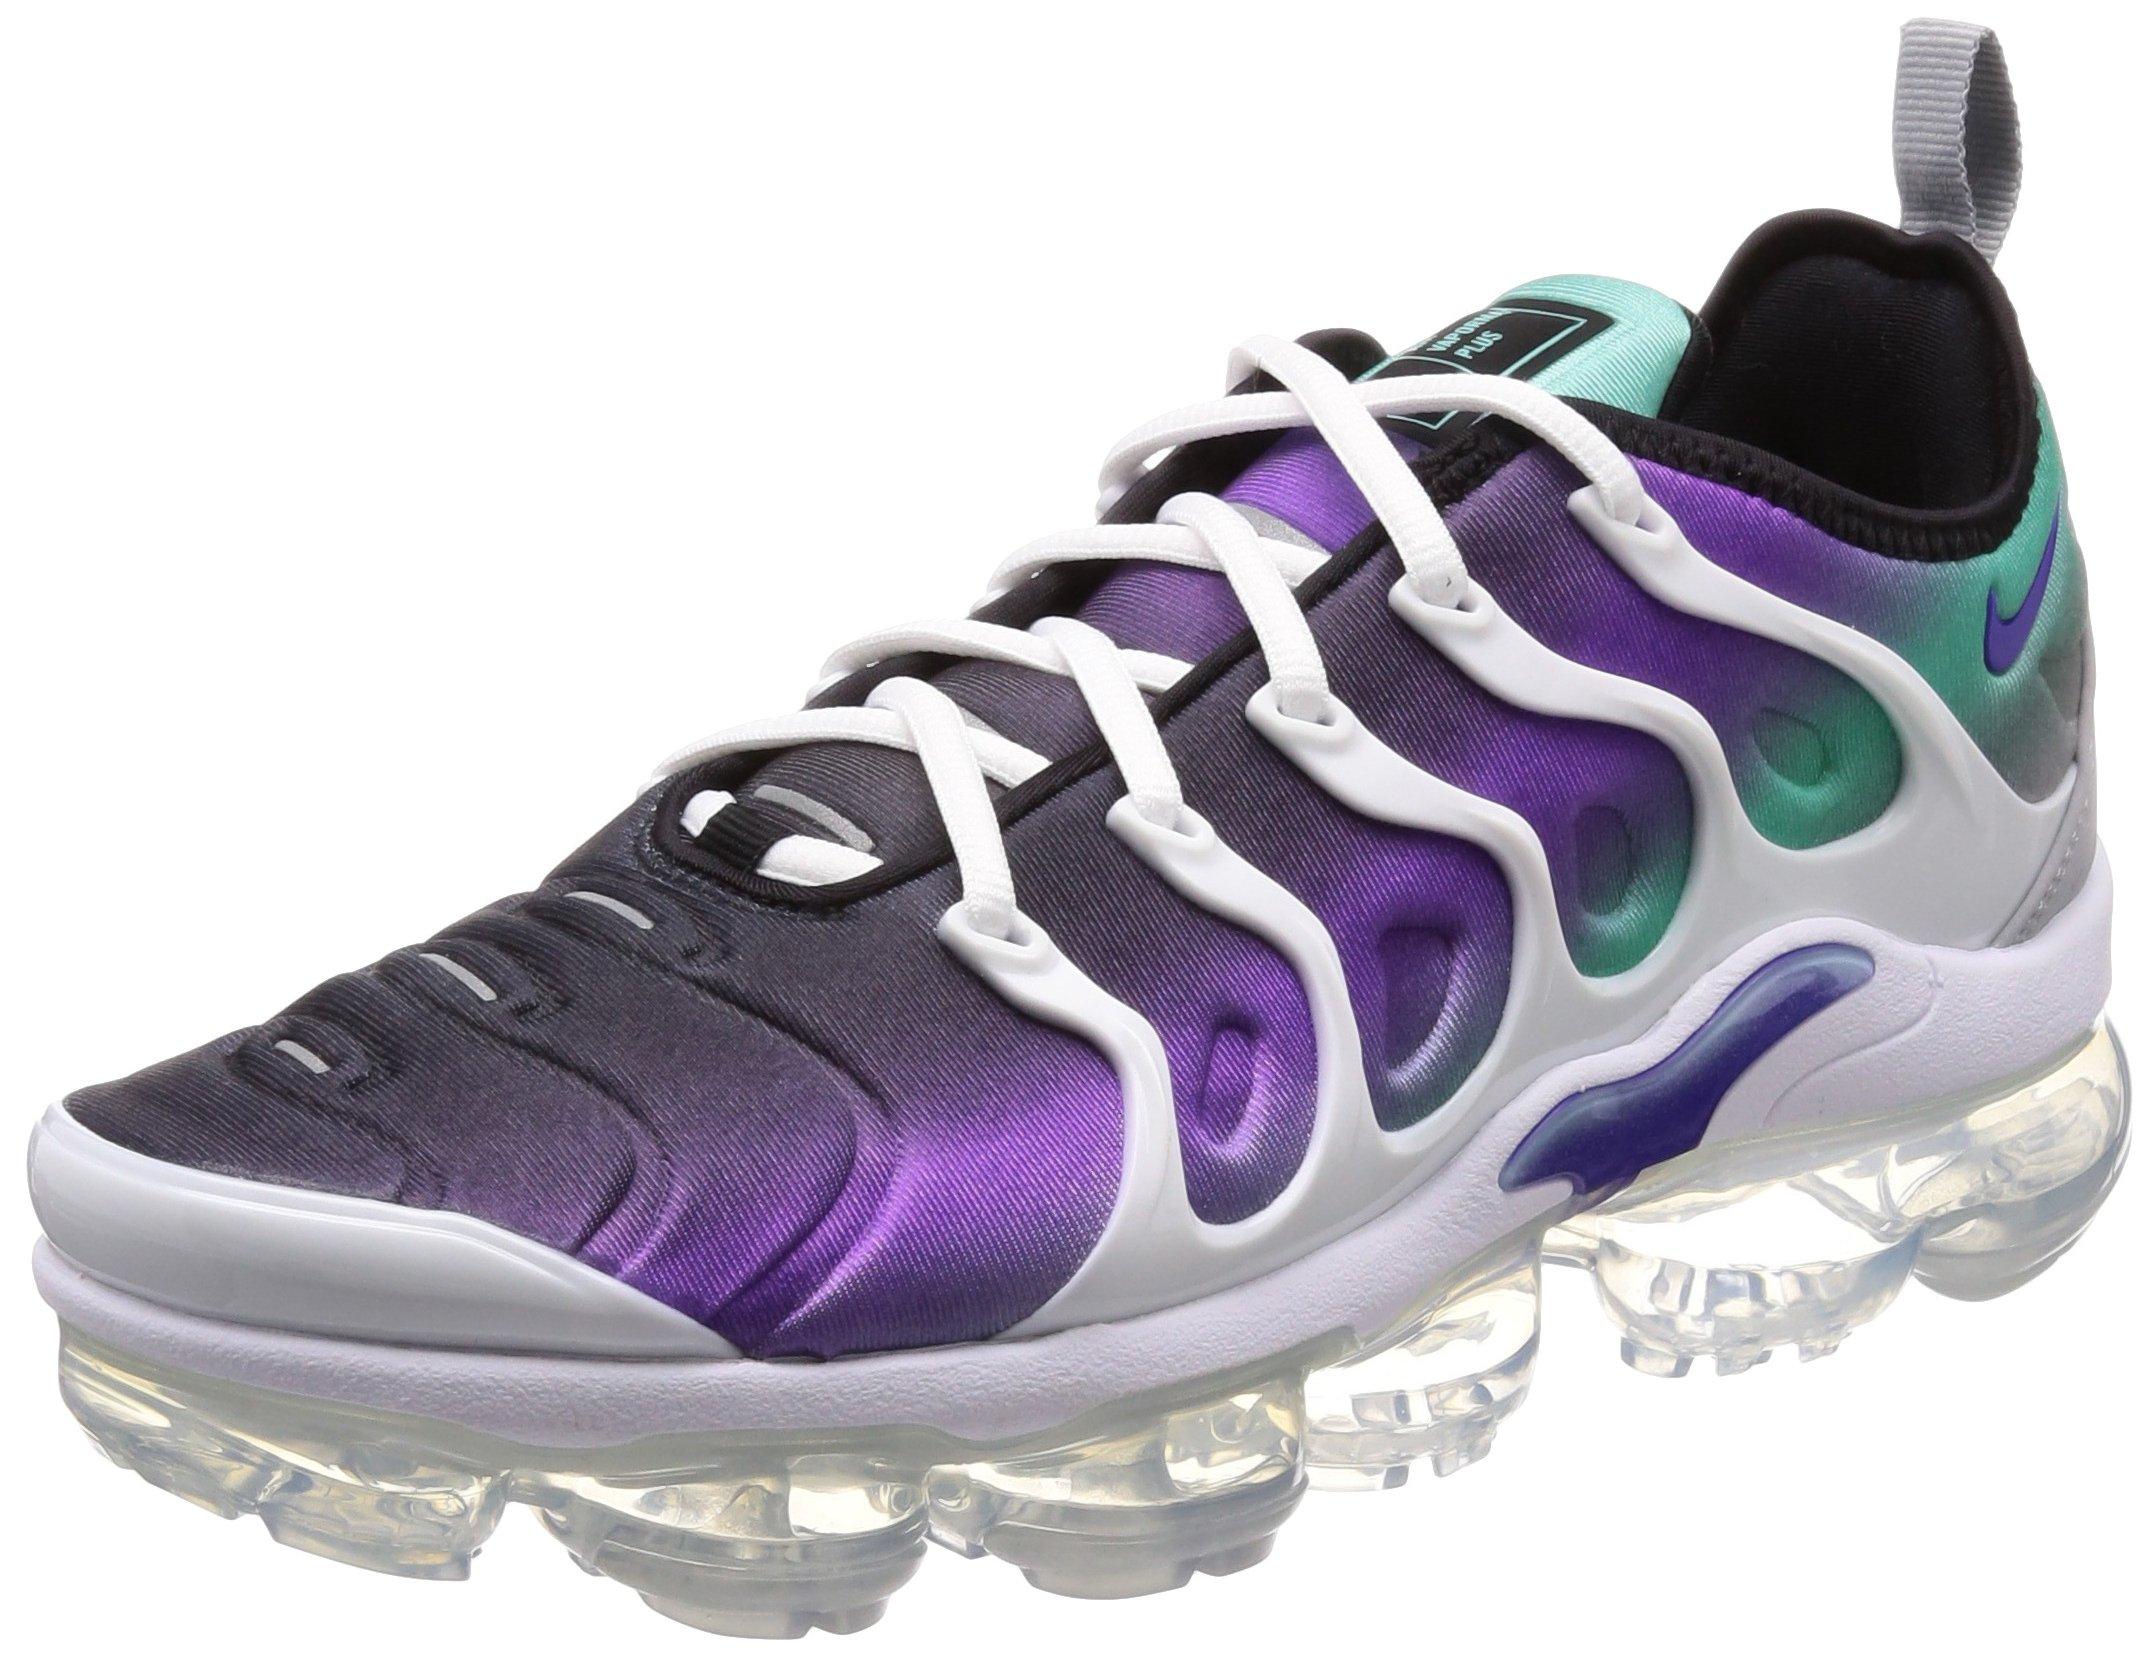 huge selection of f8674 2be71 Nike Mens Air Vapormax Plus White/Purple Neoprene Size 10.5